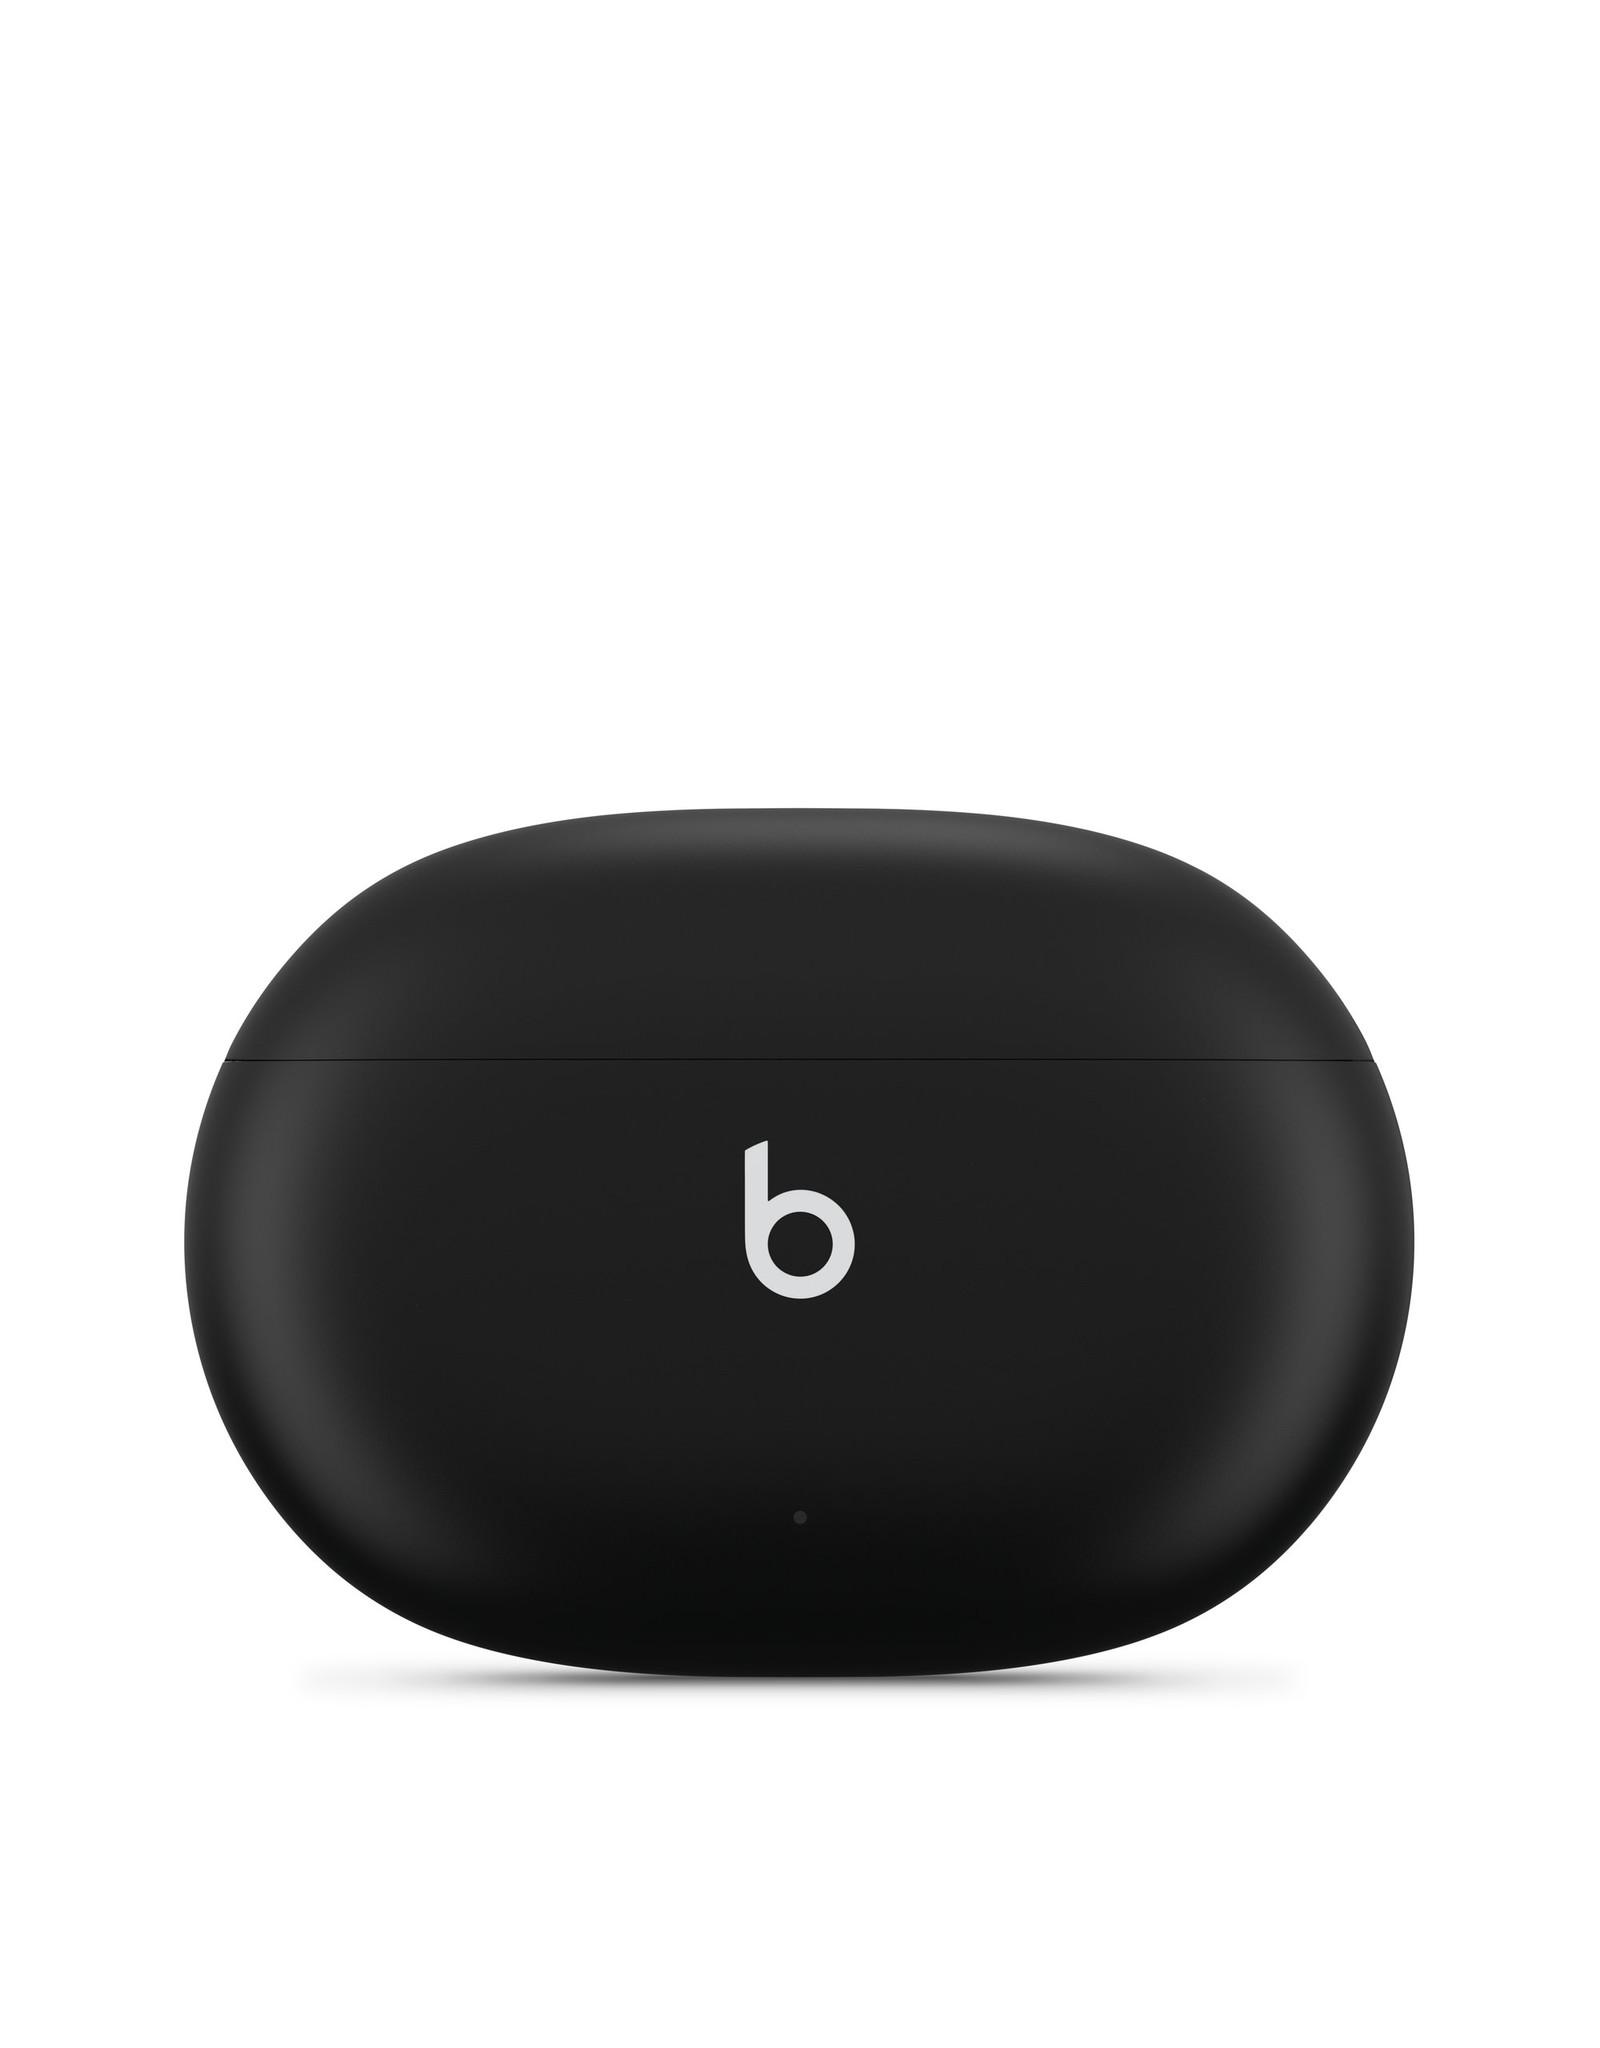 Beats Beats Studio Buds True Wireless Noise Cancelling Earphones